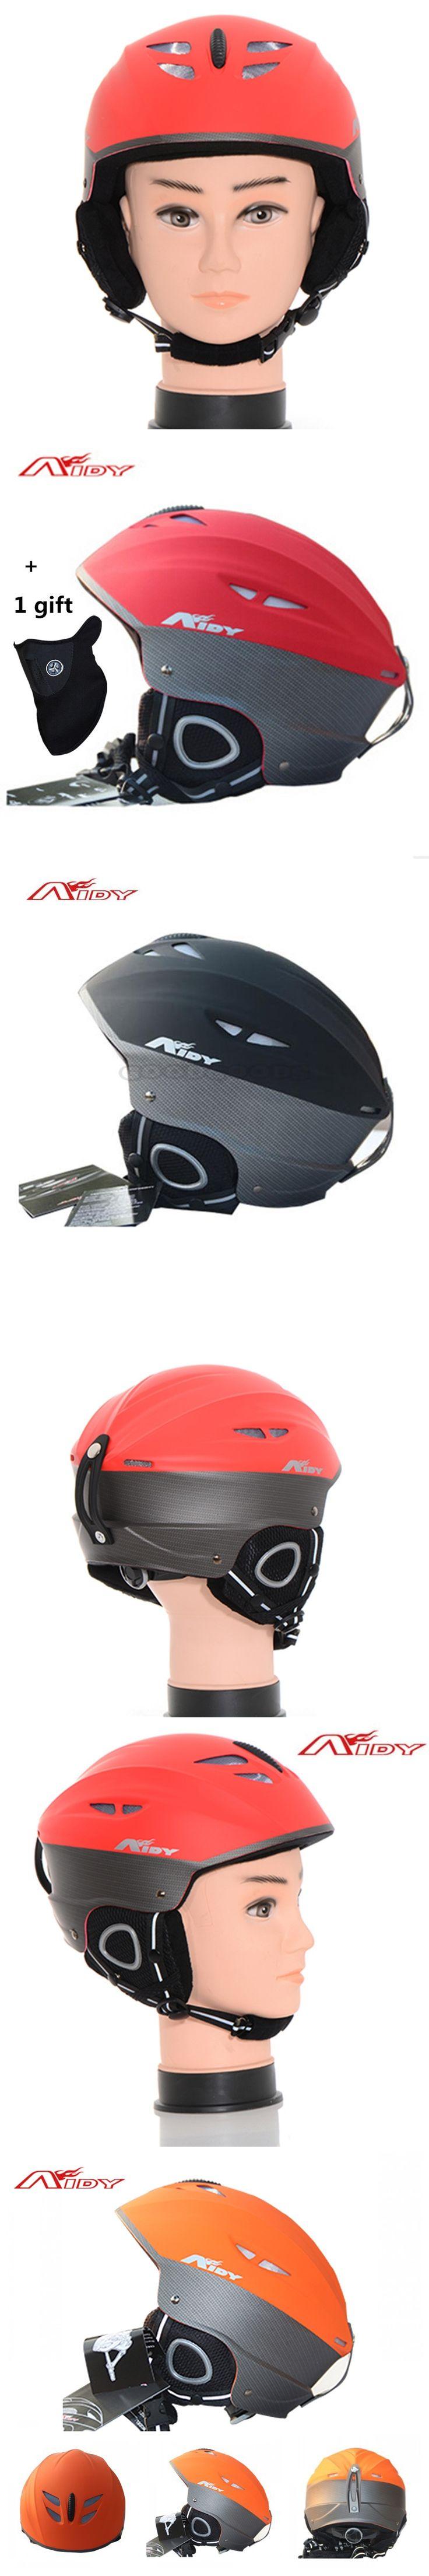 AIDY Brand Ski helmet outdoor sports Integrally-molded adjustable Snowboard snowmobile helmet kask Warm windproof Skating helmet